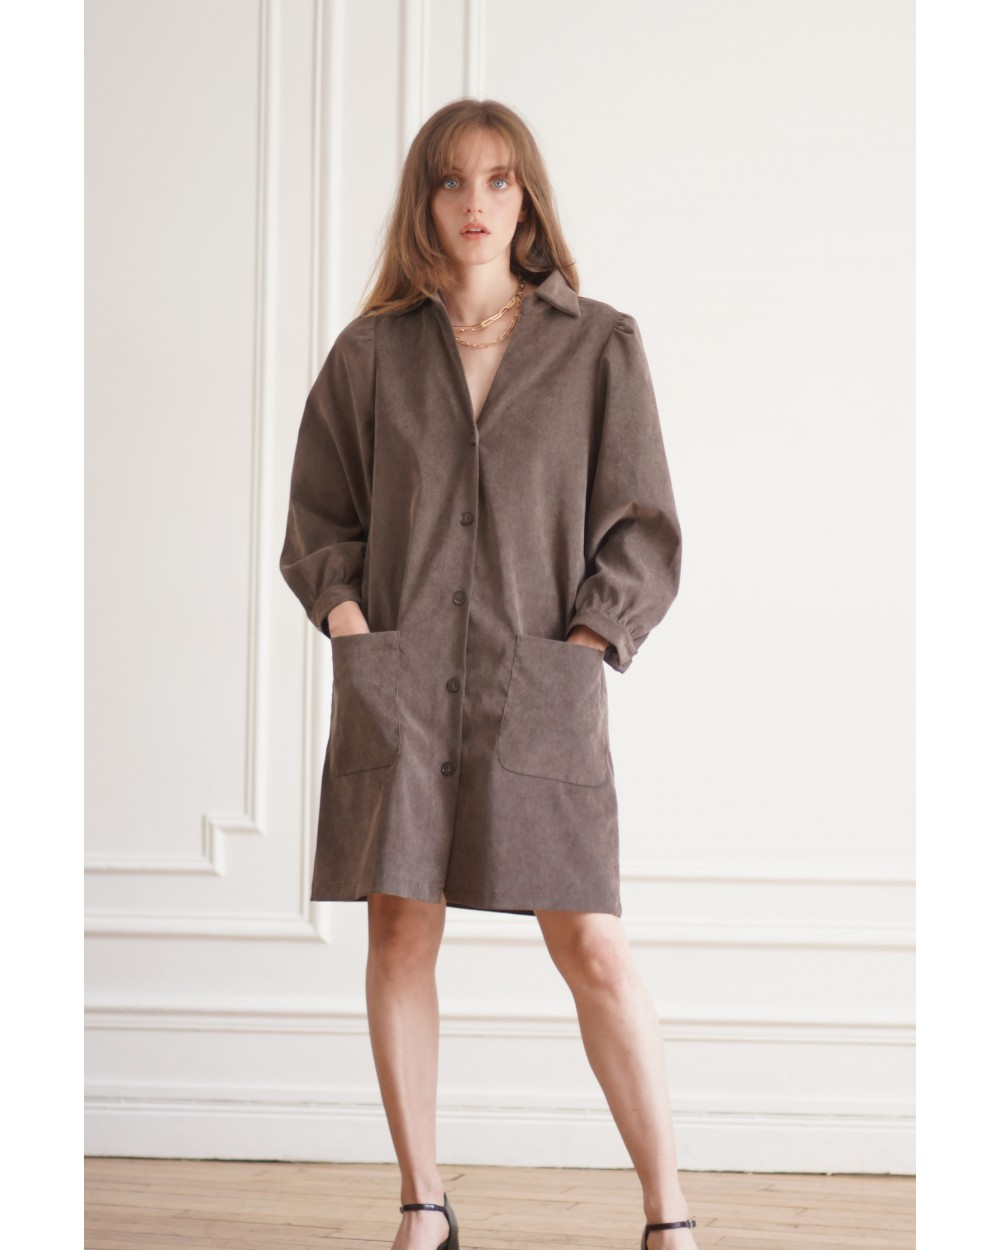 Robe marron style écolier